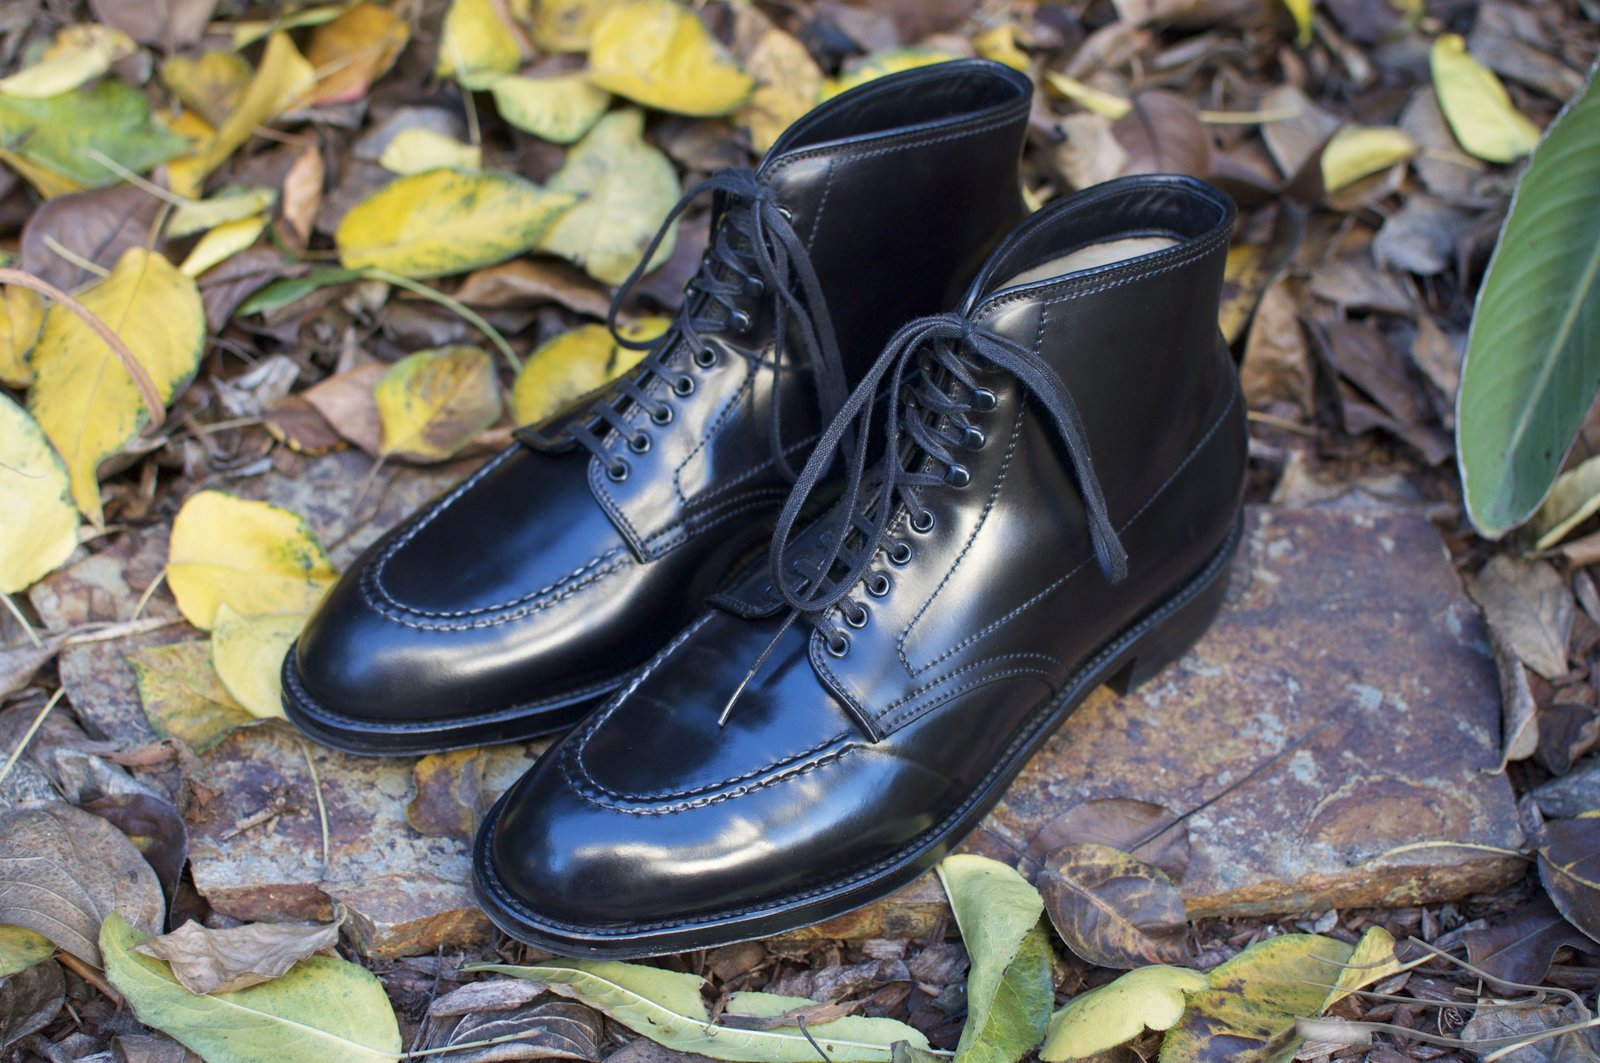 Alden Black Shell Cordovan U-Tip Boots - 2020-11-27 - 1.jpg